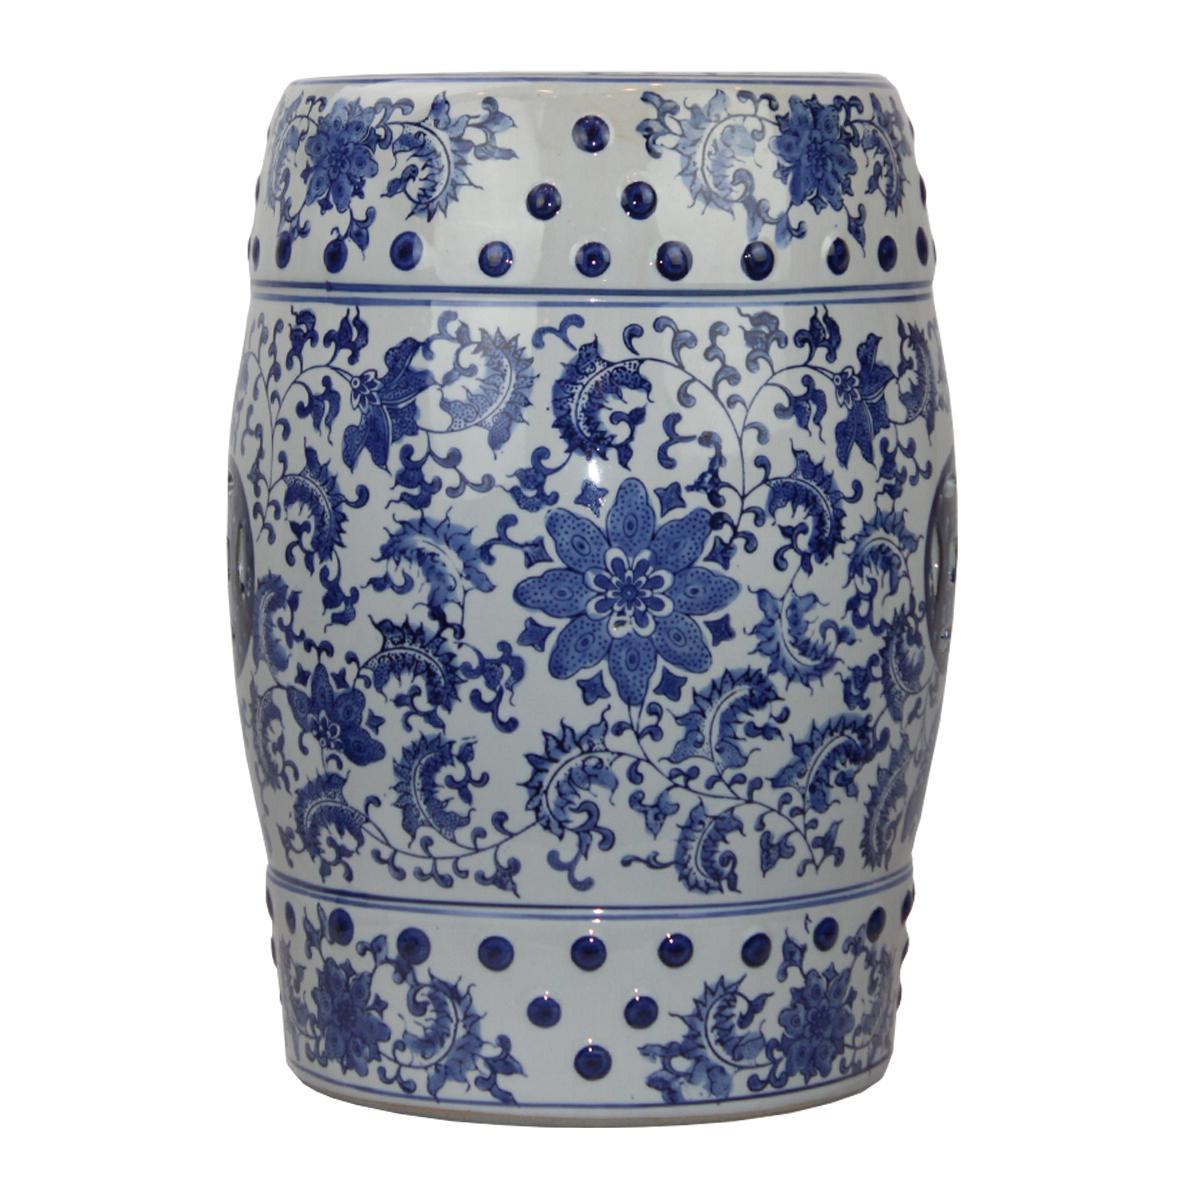 Wiese Cherry Blossom Ceramic Garden Stools Pertaining To Favorite Malcom Modern Contemporary Floral Porcelain Garden Stool (View 11 of 30)